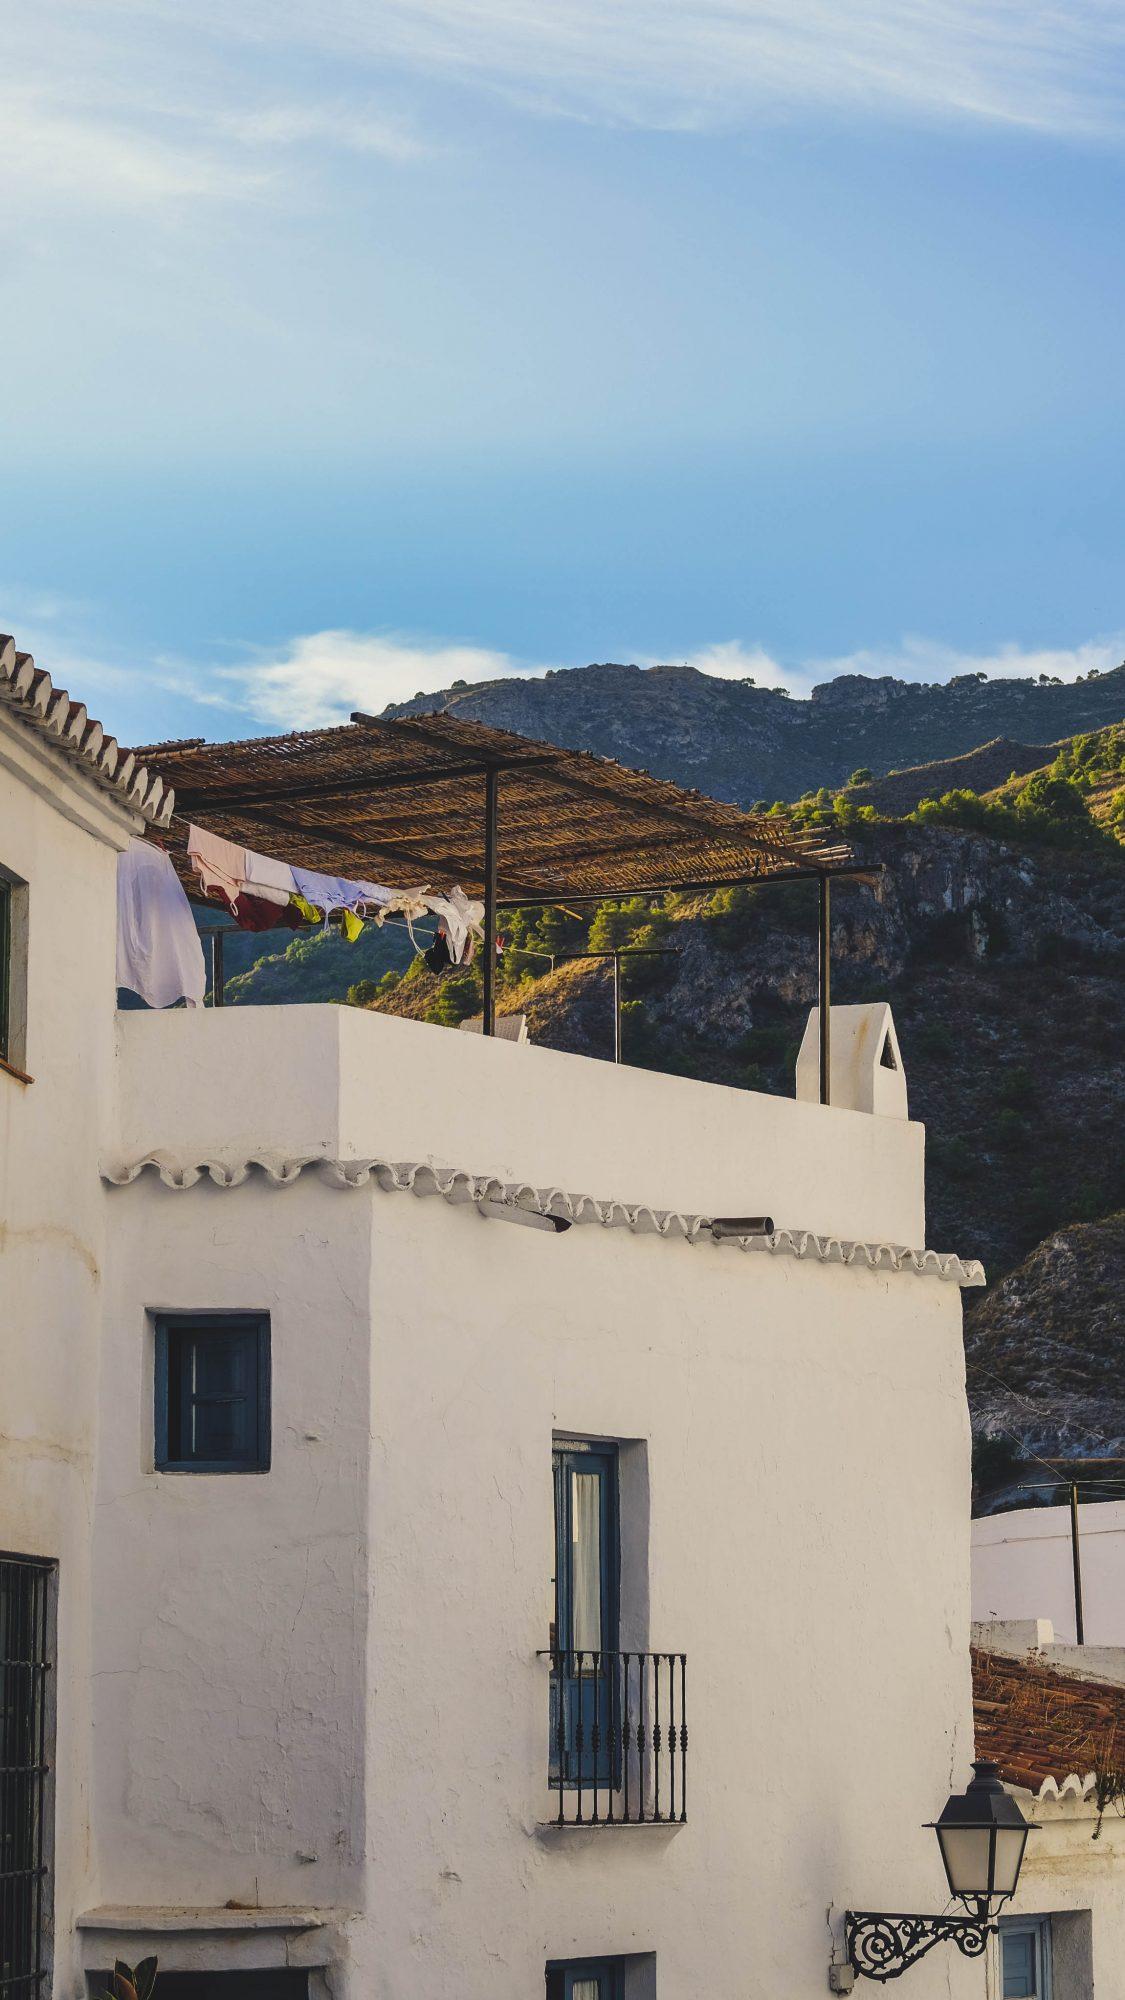 Linge au vent - Frigiliana, Espagne